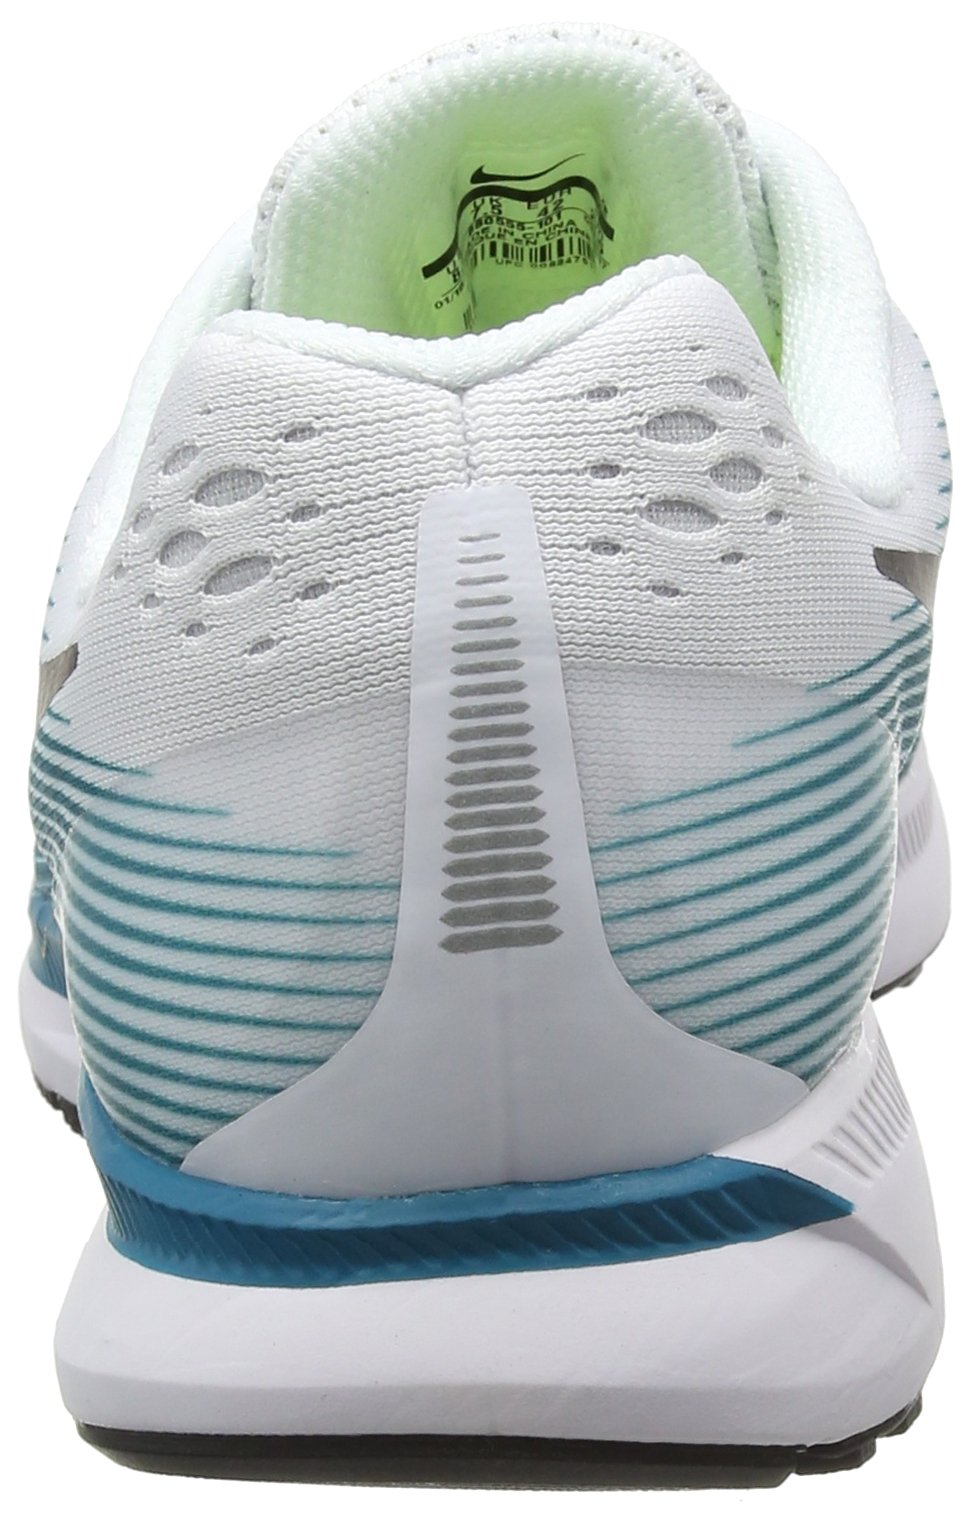 Nike Men's Air Zoom Pegasus 34 White / Black - Blustery 880555-101 (11.5) by NIKE (Image #2)